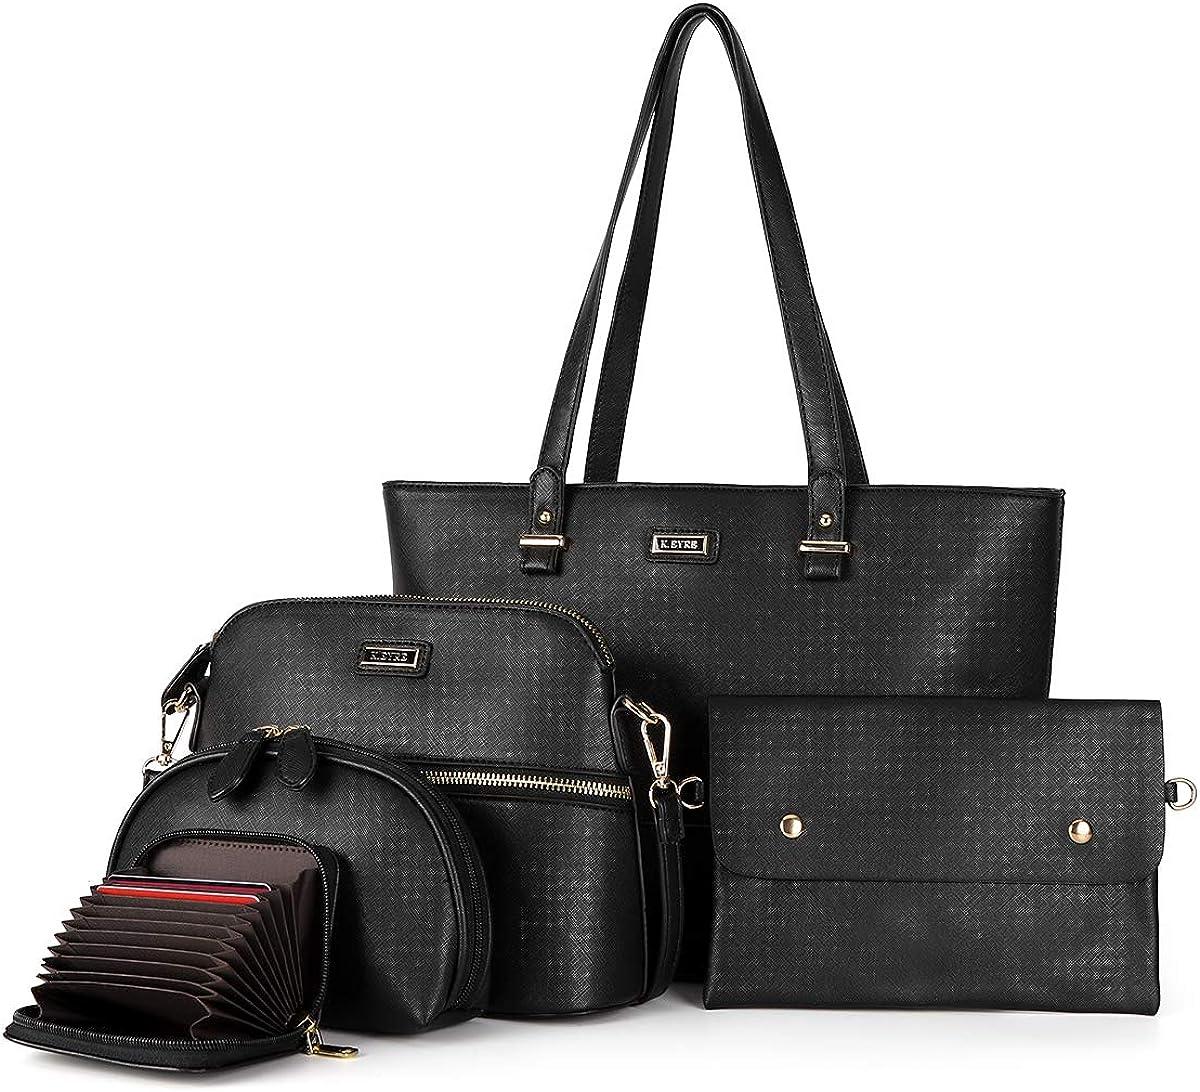 Tote Handbag for Women Vegan Leather Shoulder Bag Hobo bag Satchel Purse for Girls School Work & Shopping (L-2061#K122#401BLACK)